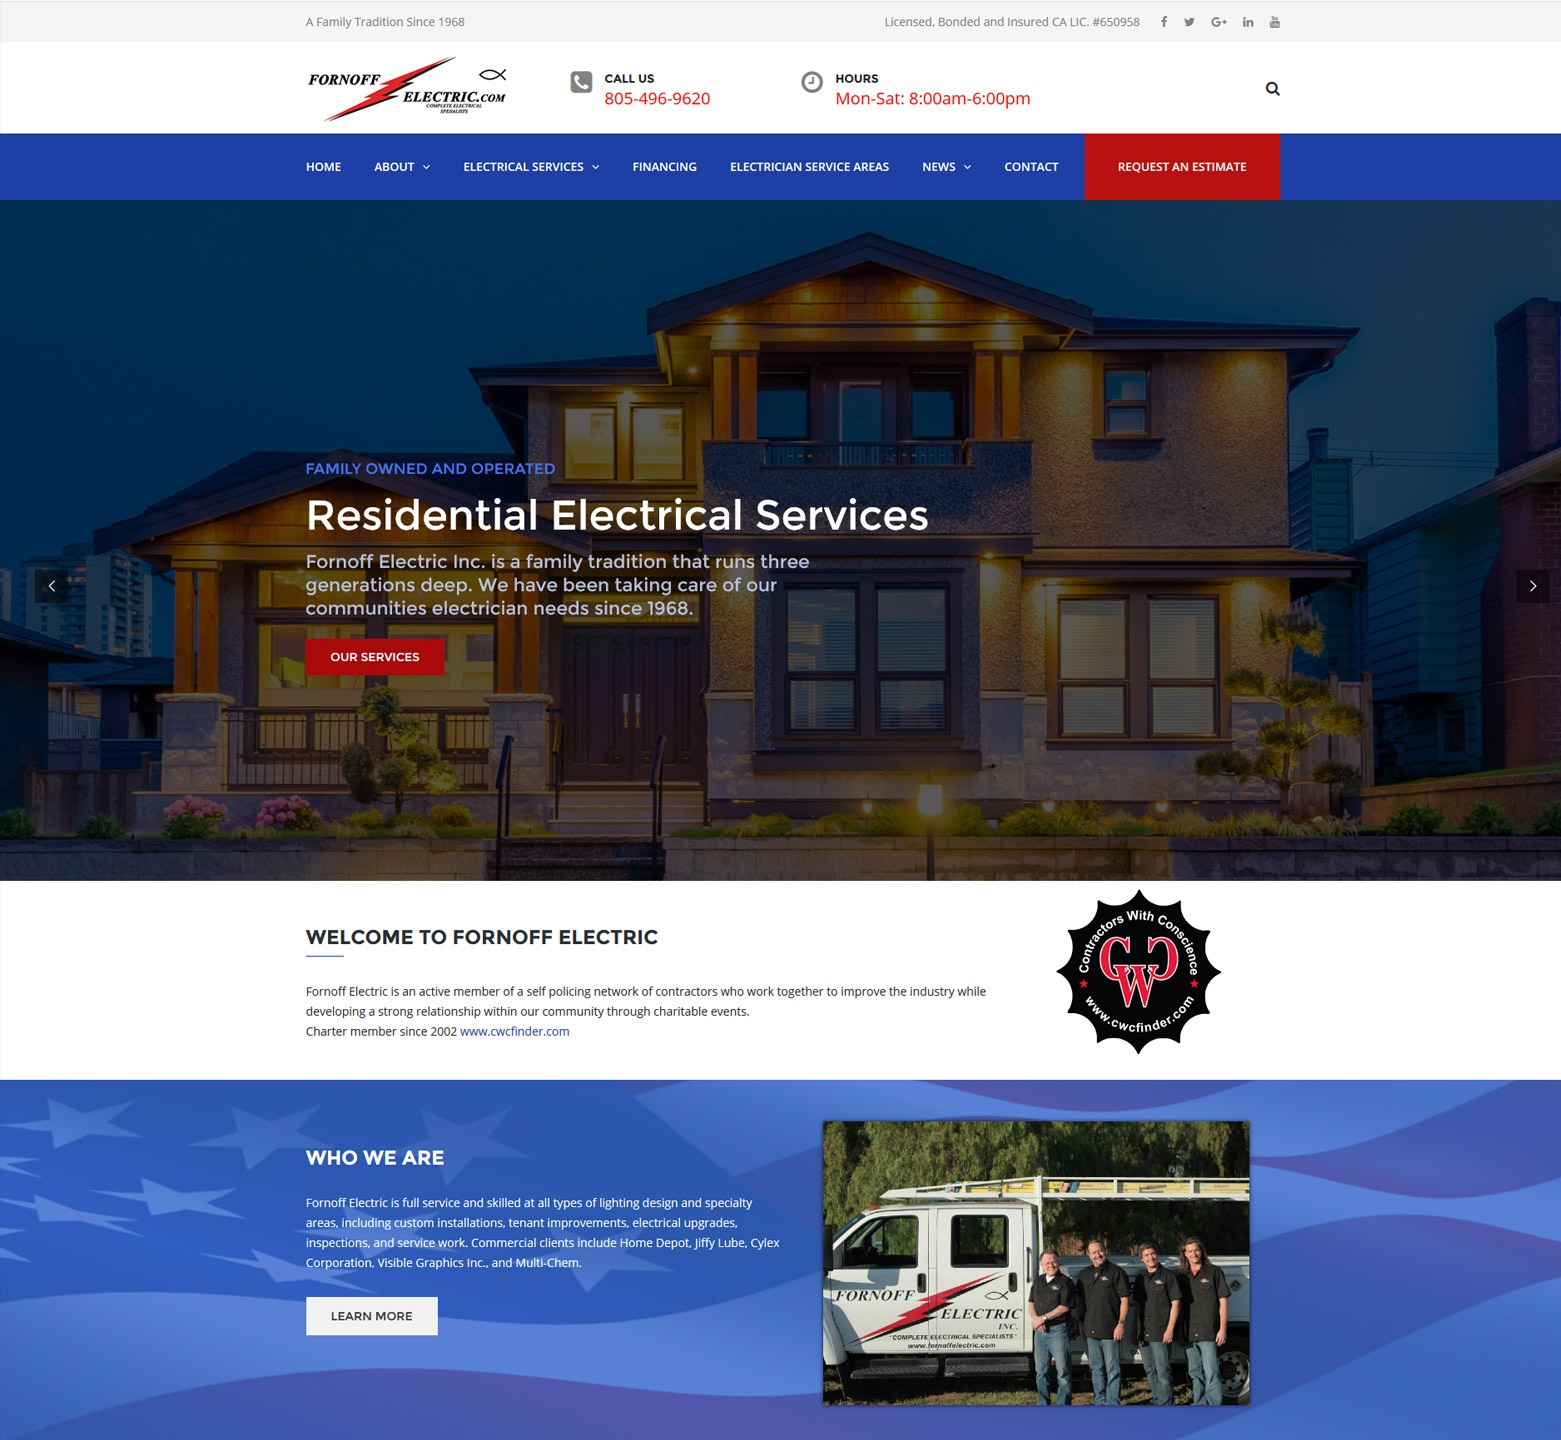 LA Angeles Electric Company Web Design Company